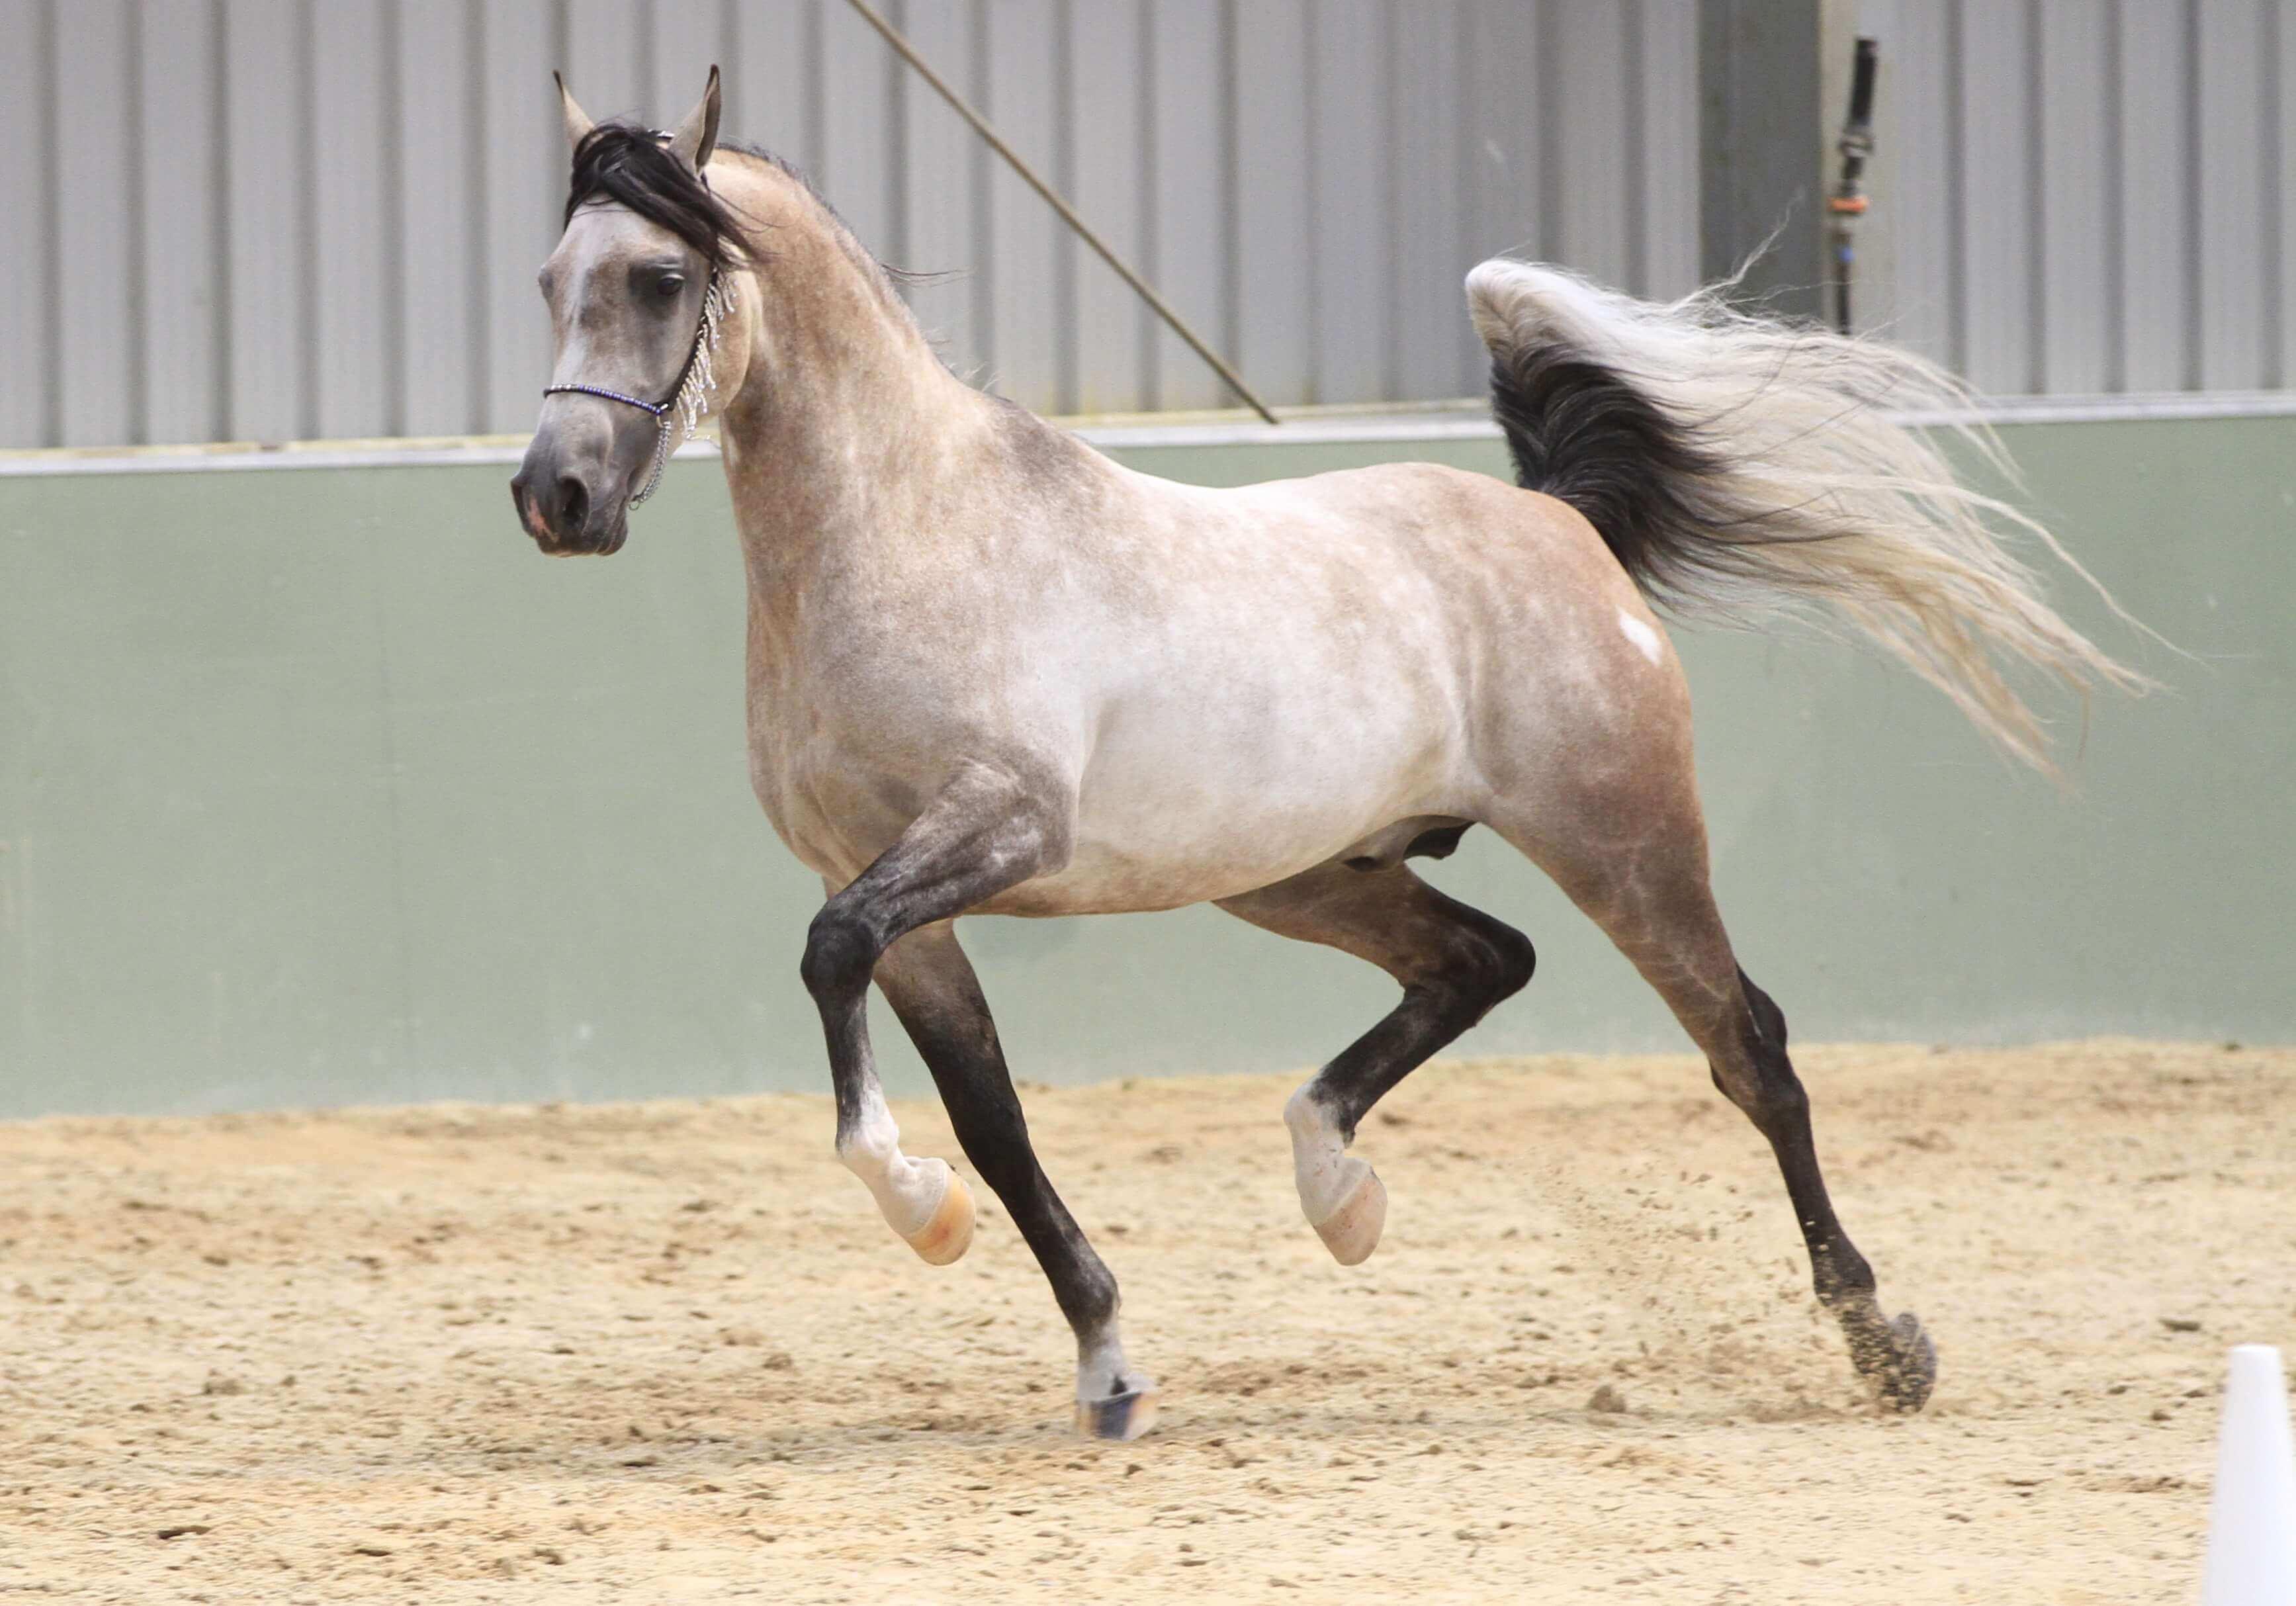 Maść szpak różany u konia